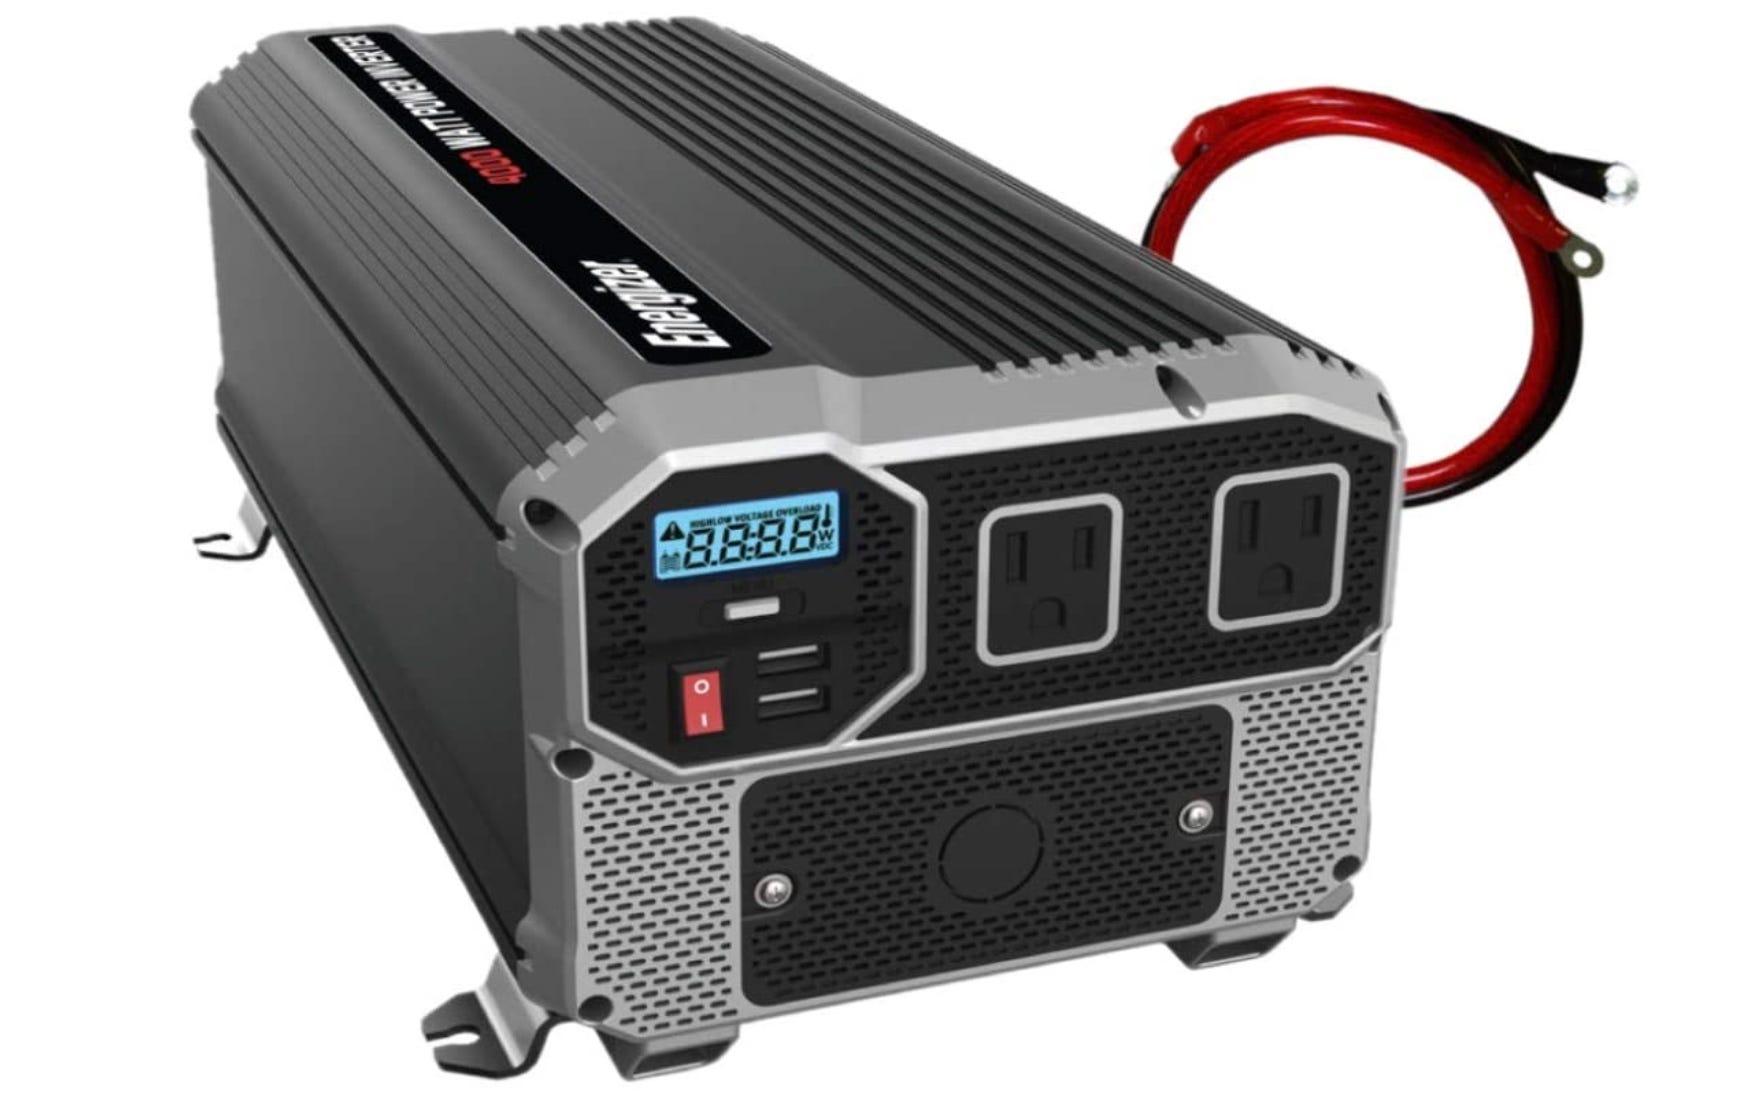 Energizer 4,000w inverter